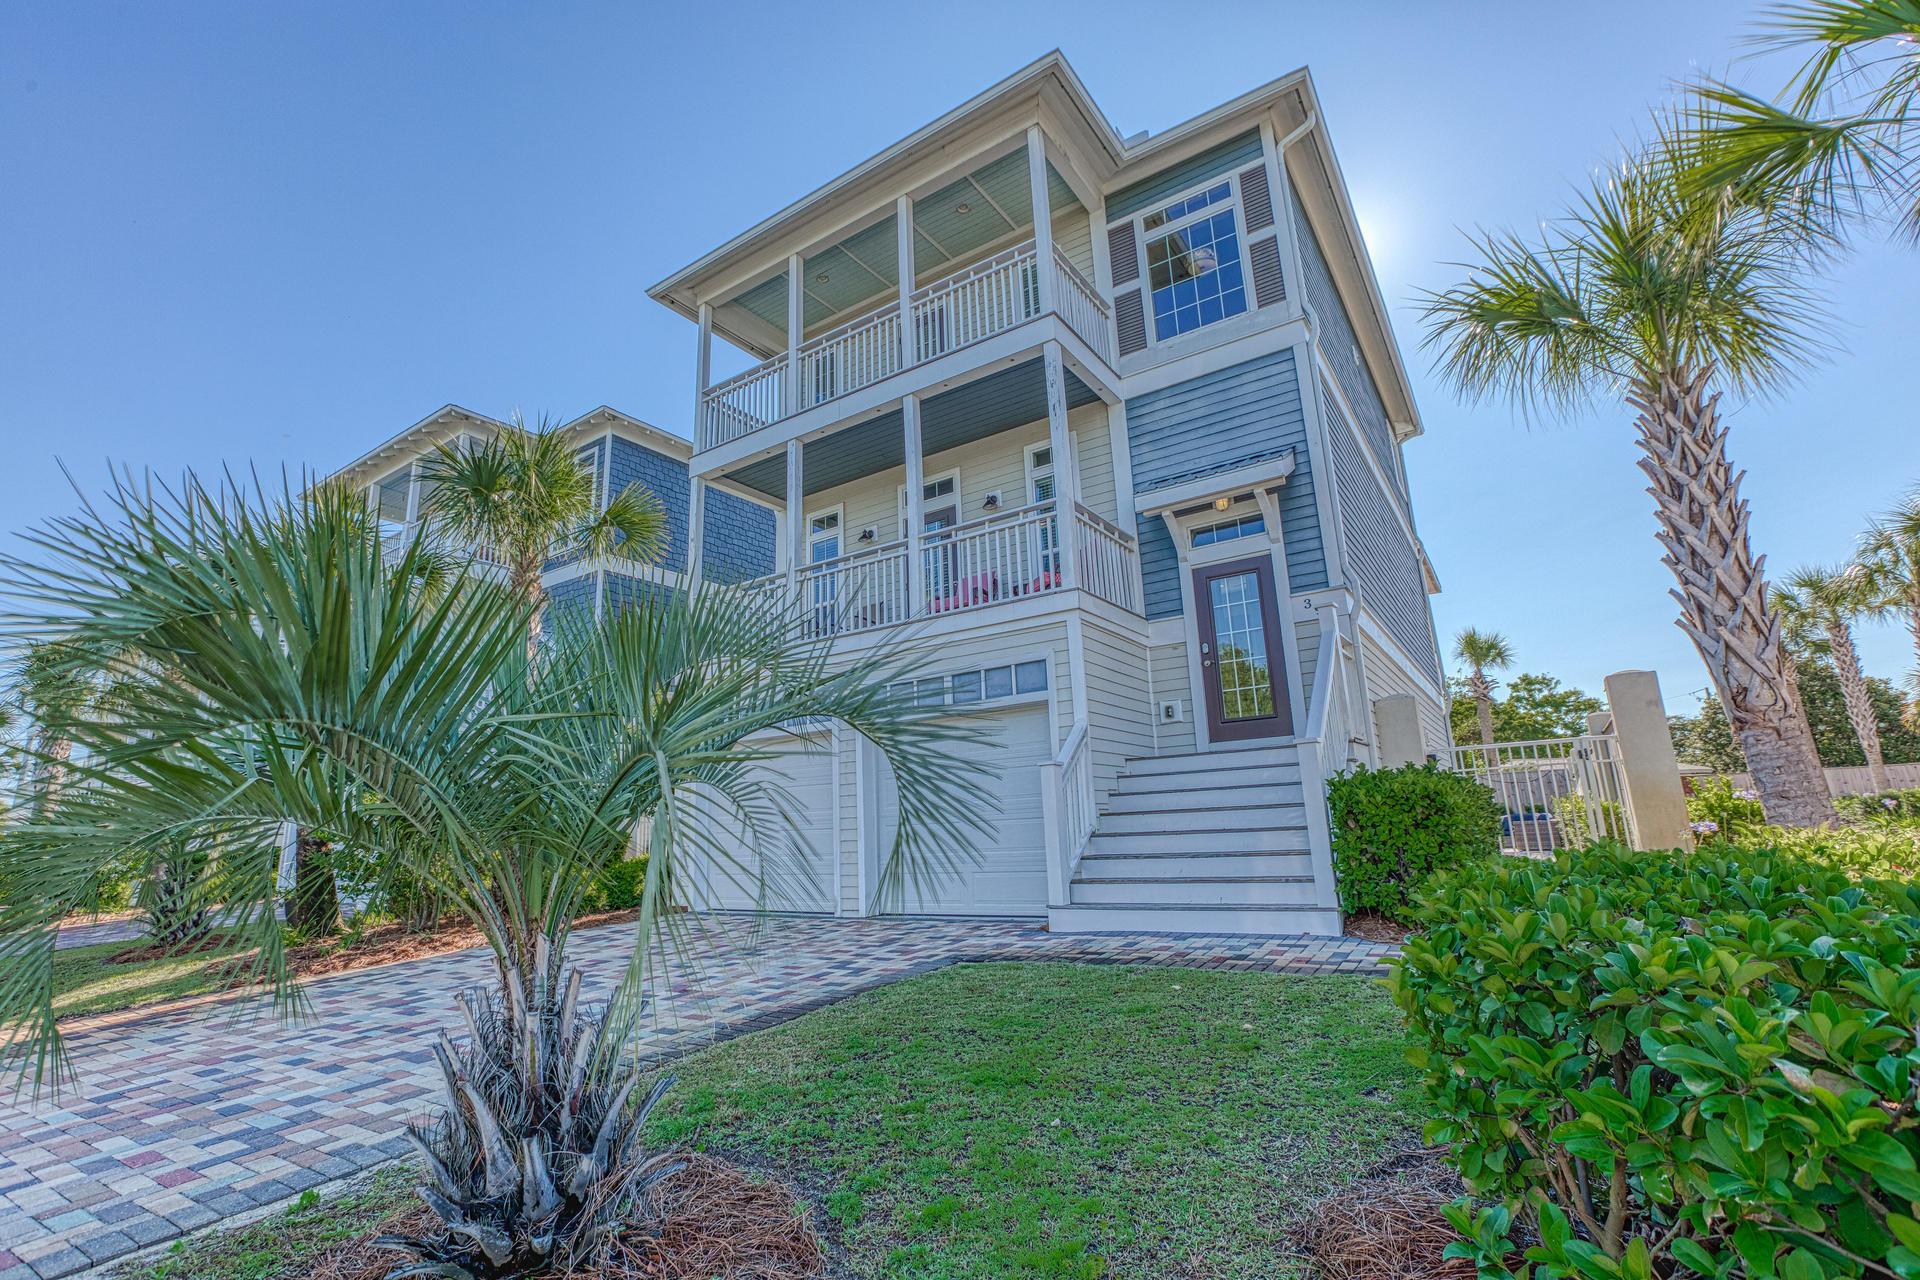 Photo of home for sale at 39 Payne, Miramar Beach FL